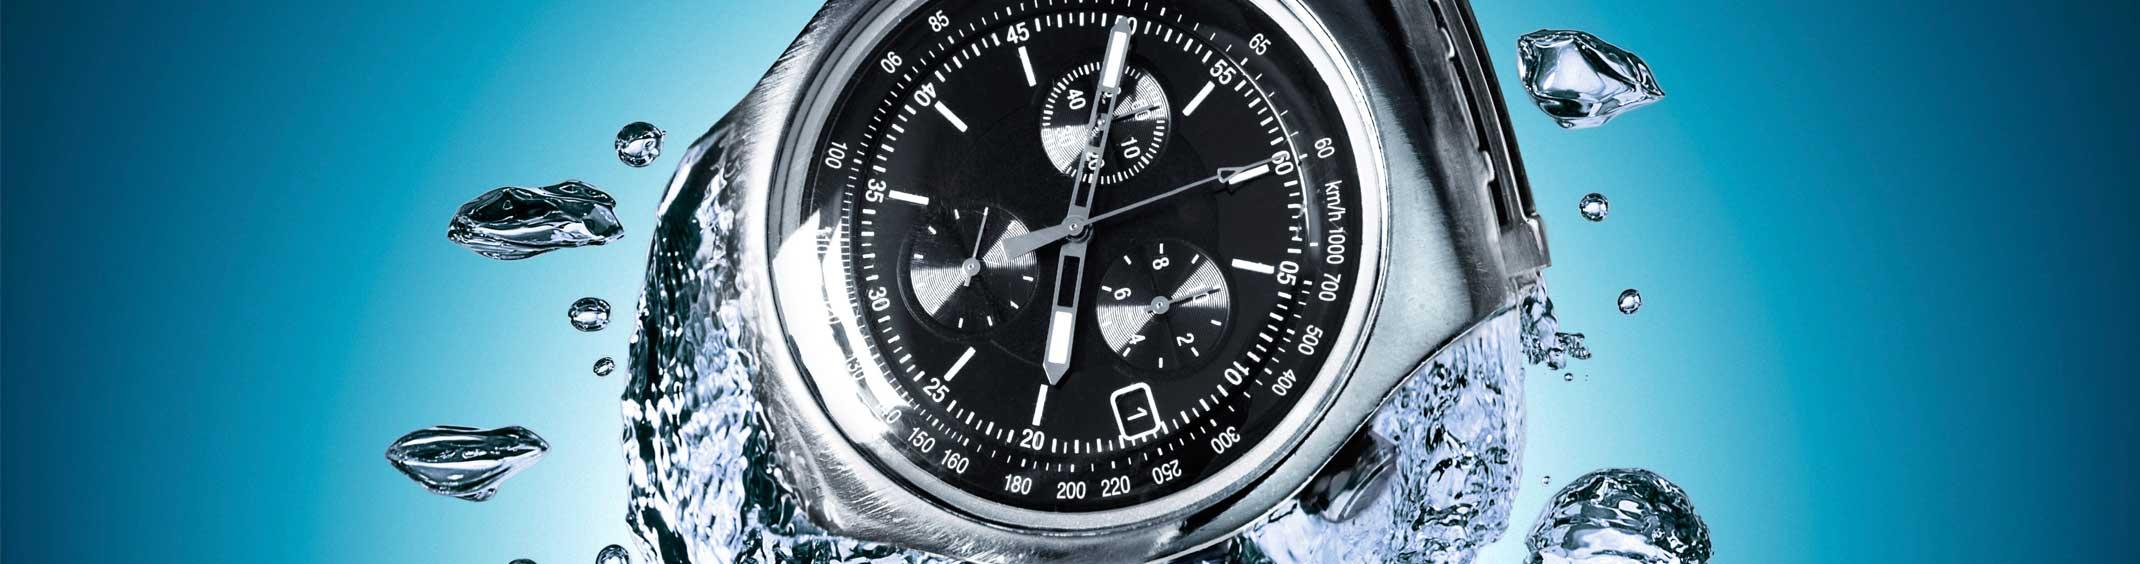 Waterdichte Horloges